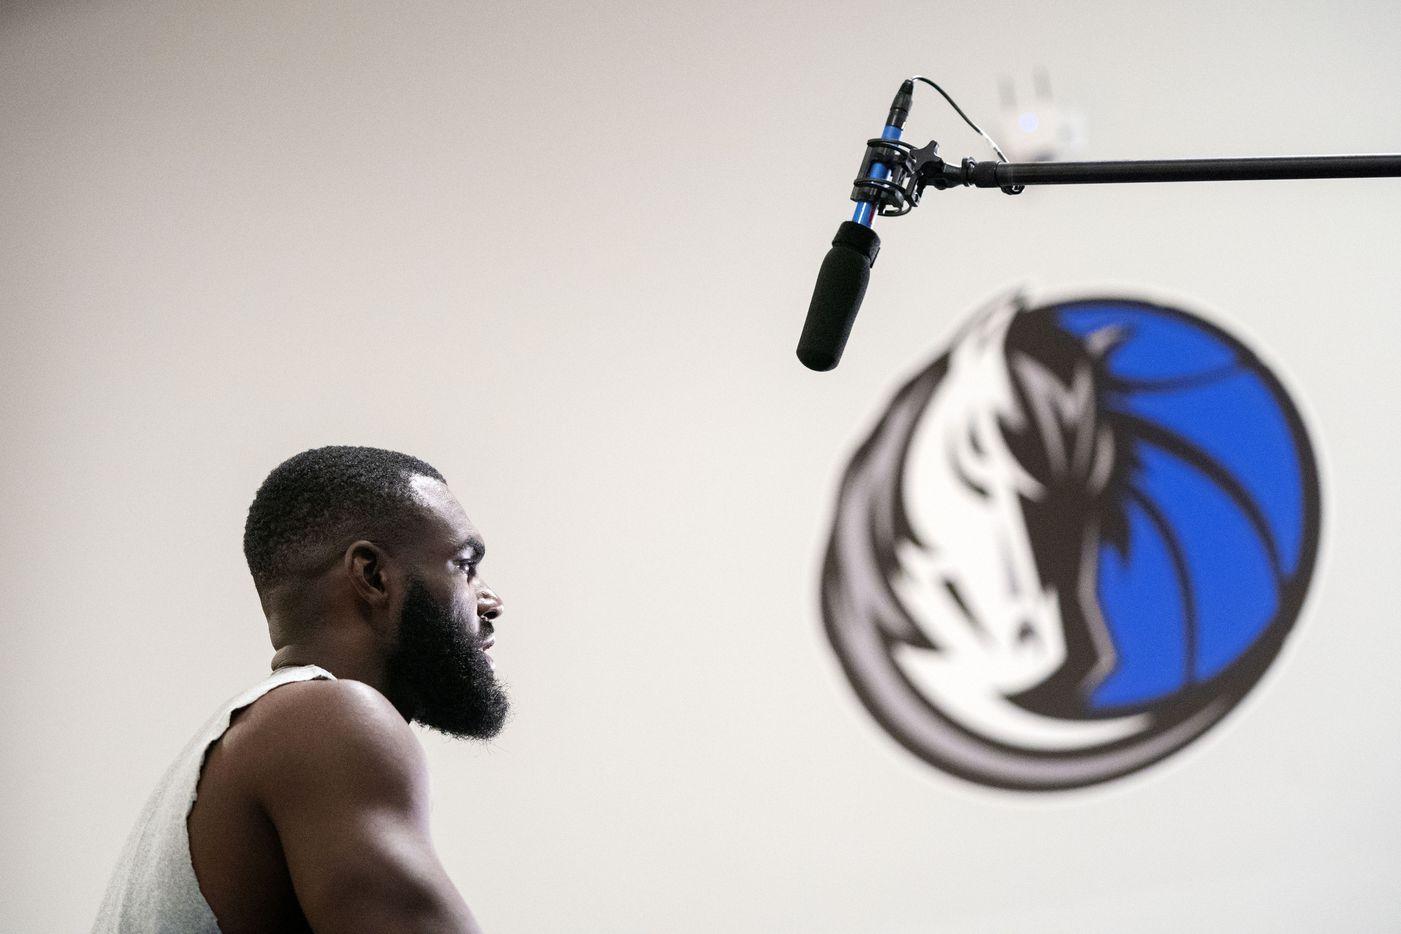 Dallas Mavericks guard Tim Hardaway Jr. speaks to the media during a training camp practice Wednesday, September 29, 2021 at the Dallas Mavericks Training Center in Dallas. (Jeffrey McWhorter/Special Contributor)